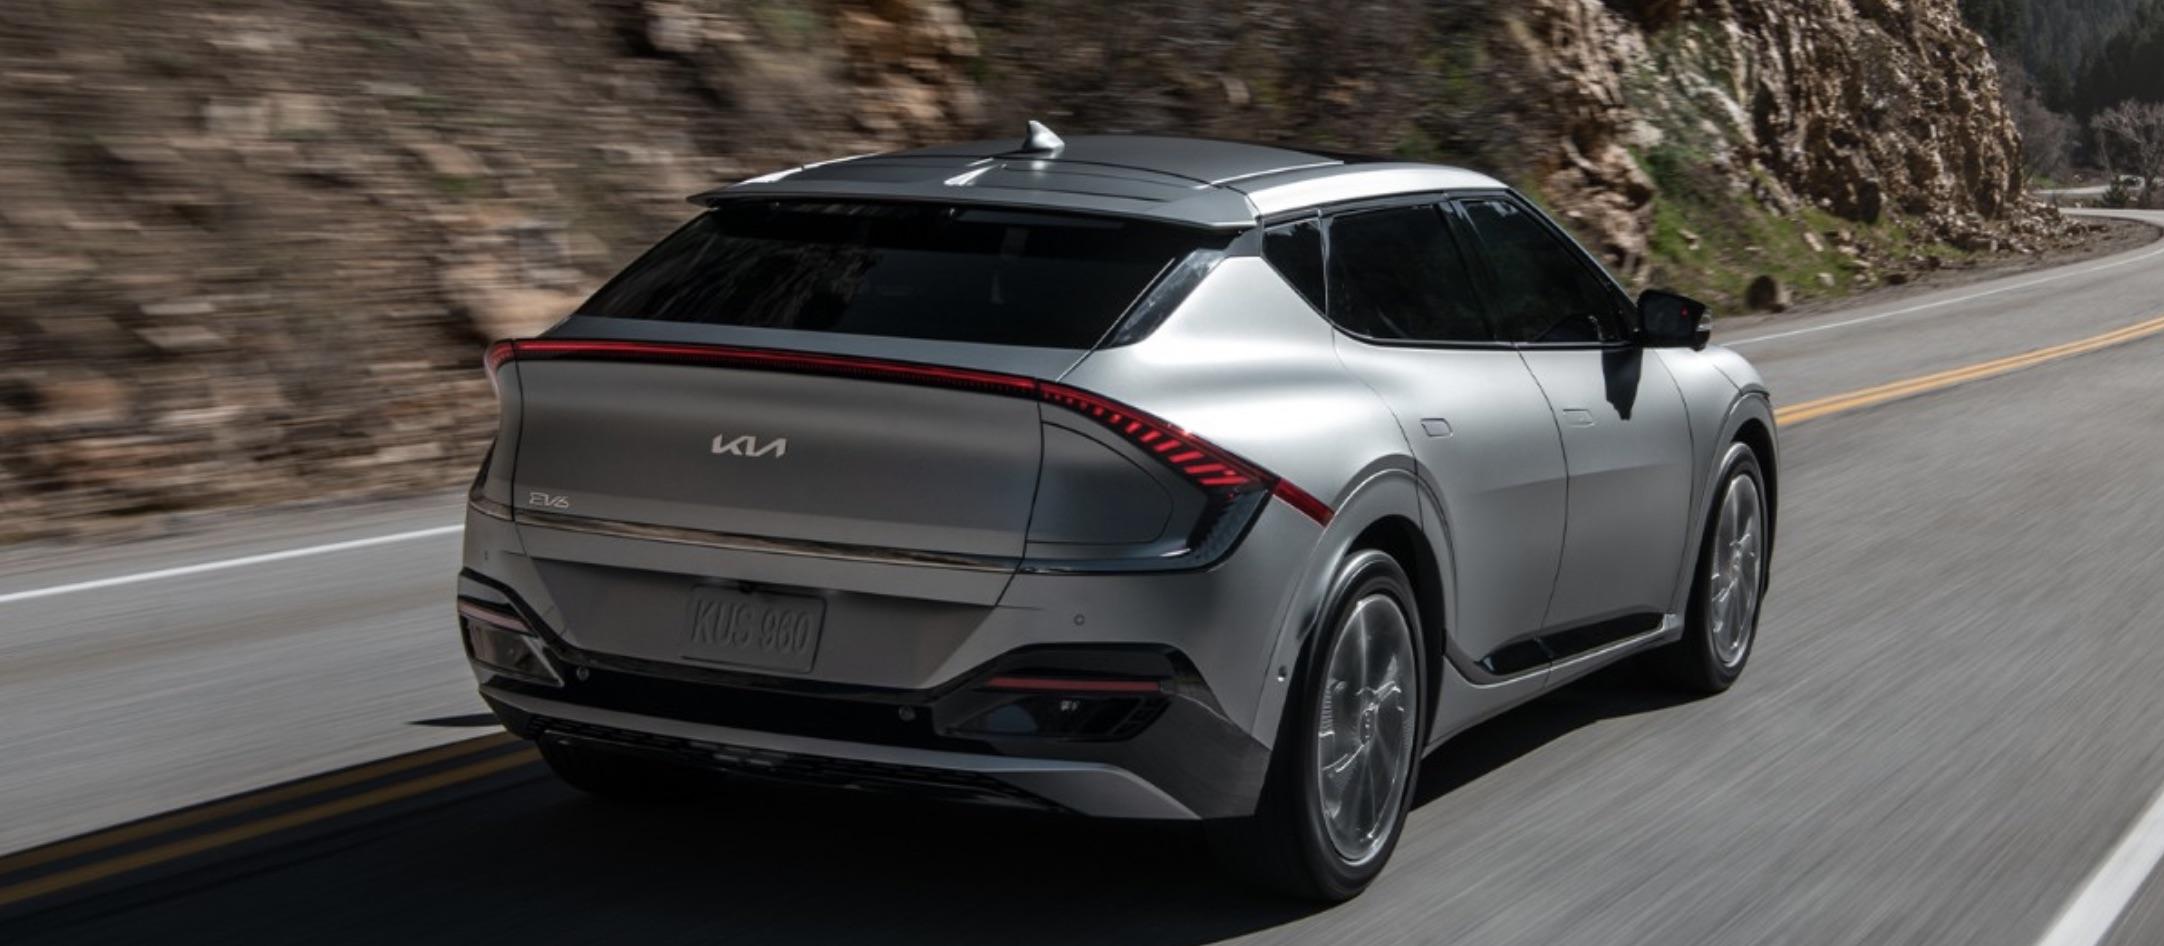 Driving the 2022 Kia EV6 around the streets of North Brunswick.